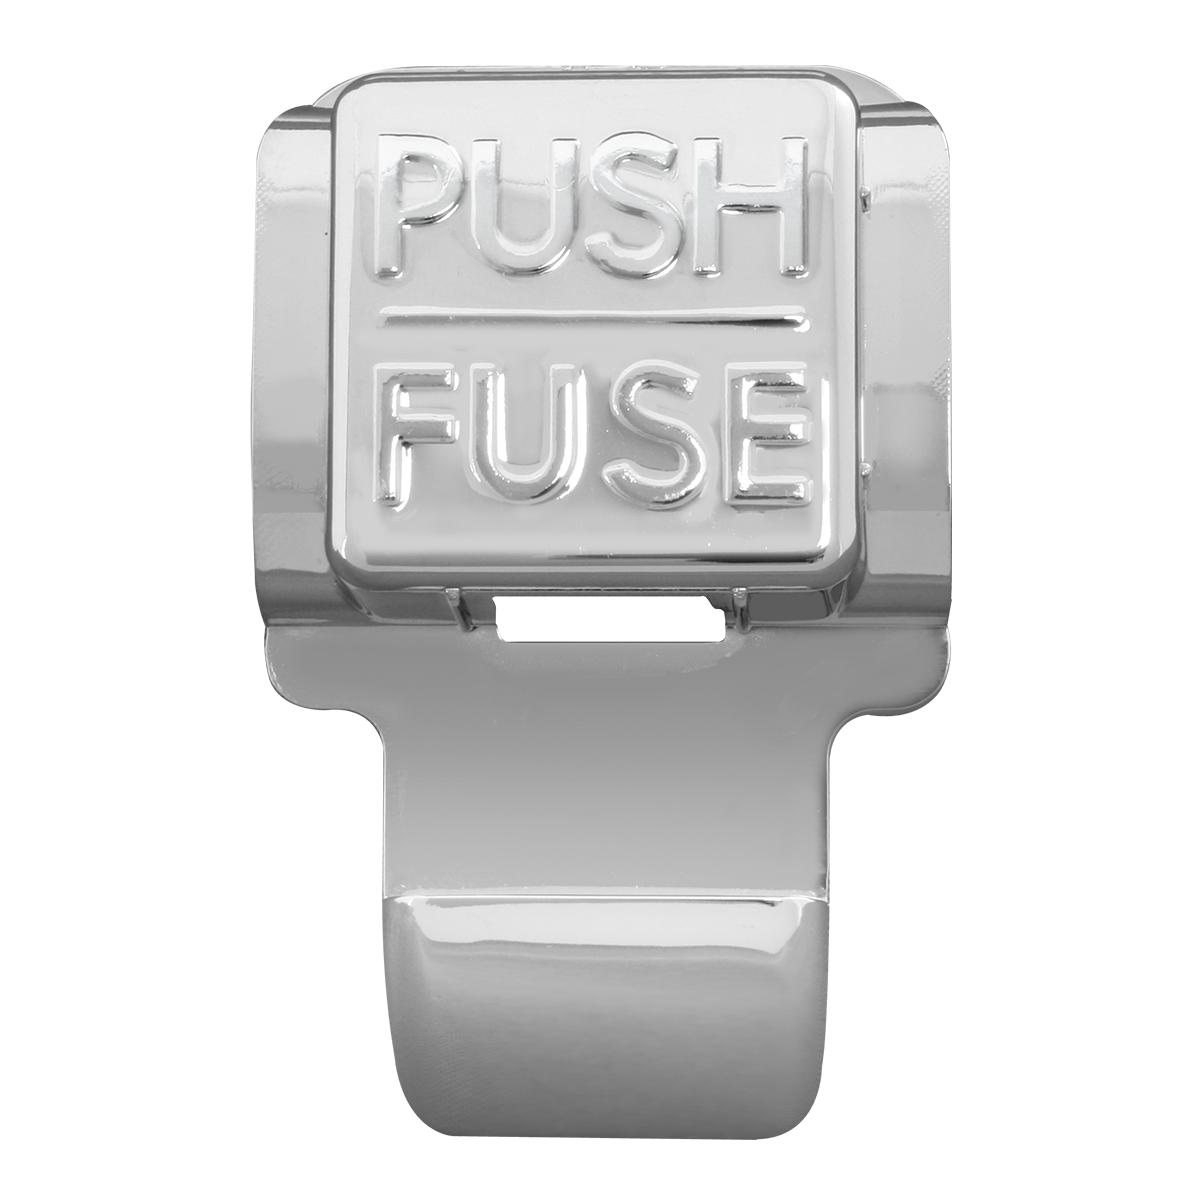 fuse box push button for freightliner grand general auto parts rh grandgeneral com old push button fuse box old push button fuse box